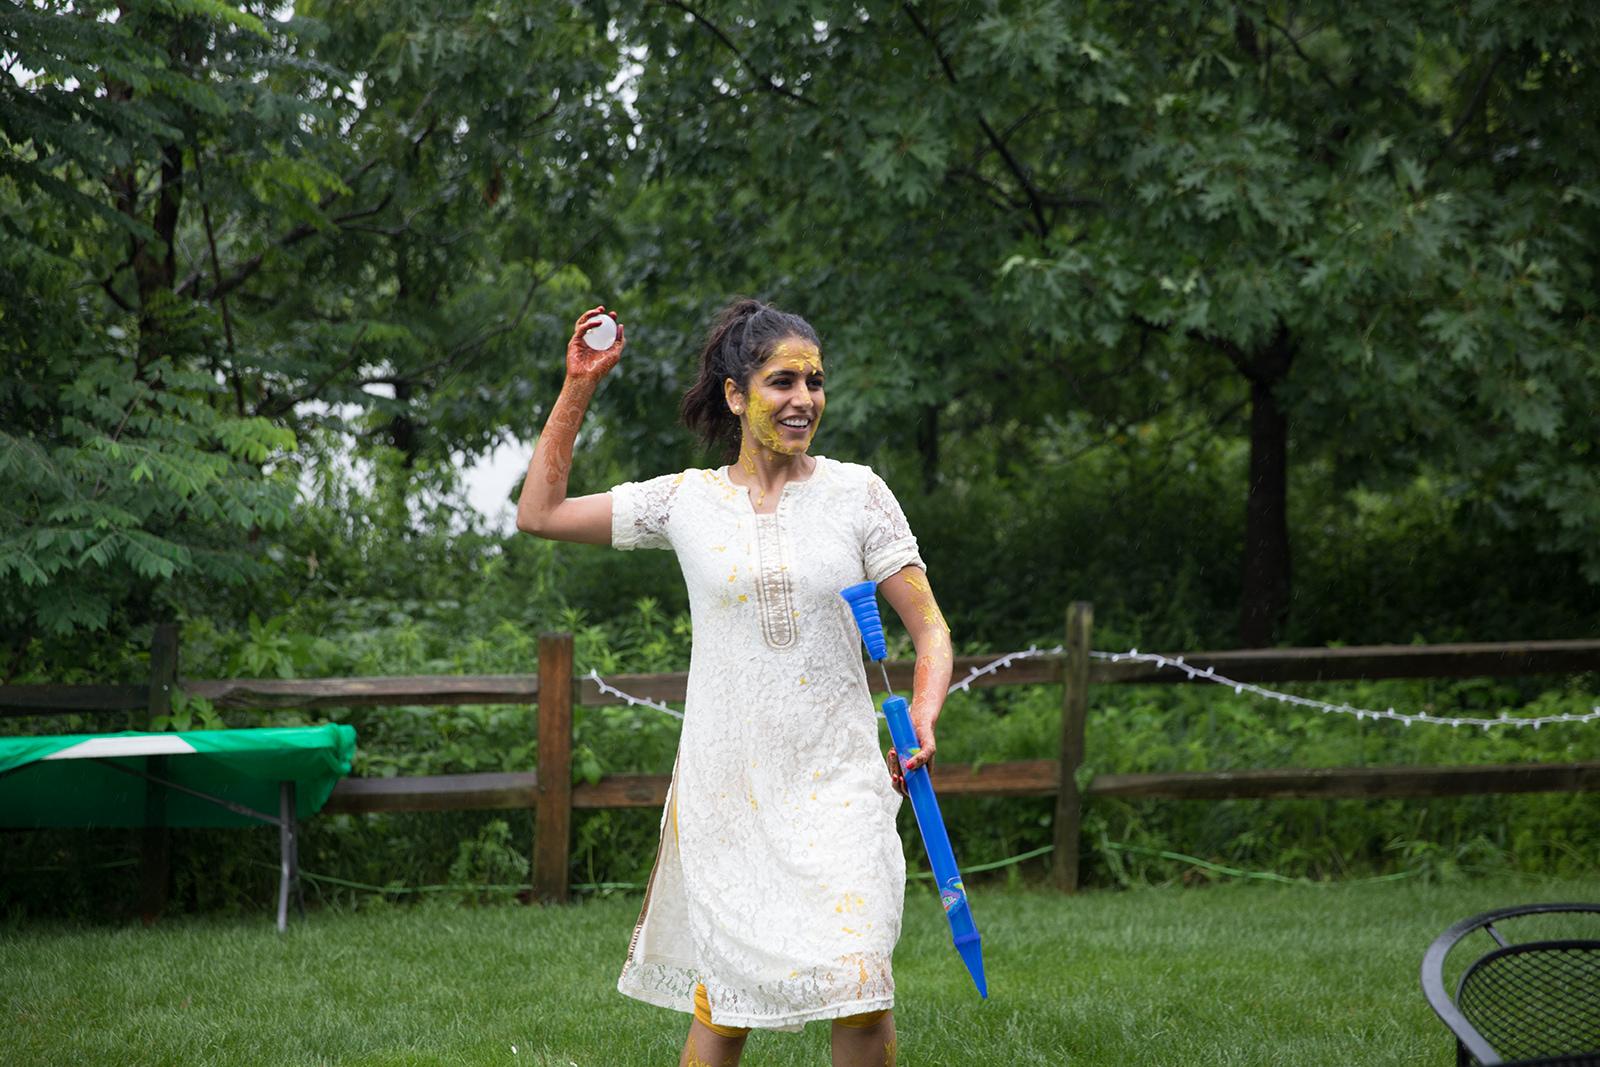 Le Cape Weddings - Sumeet and Chavi - Pithi-10-2.jpg